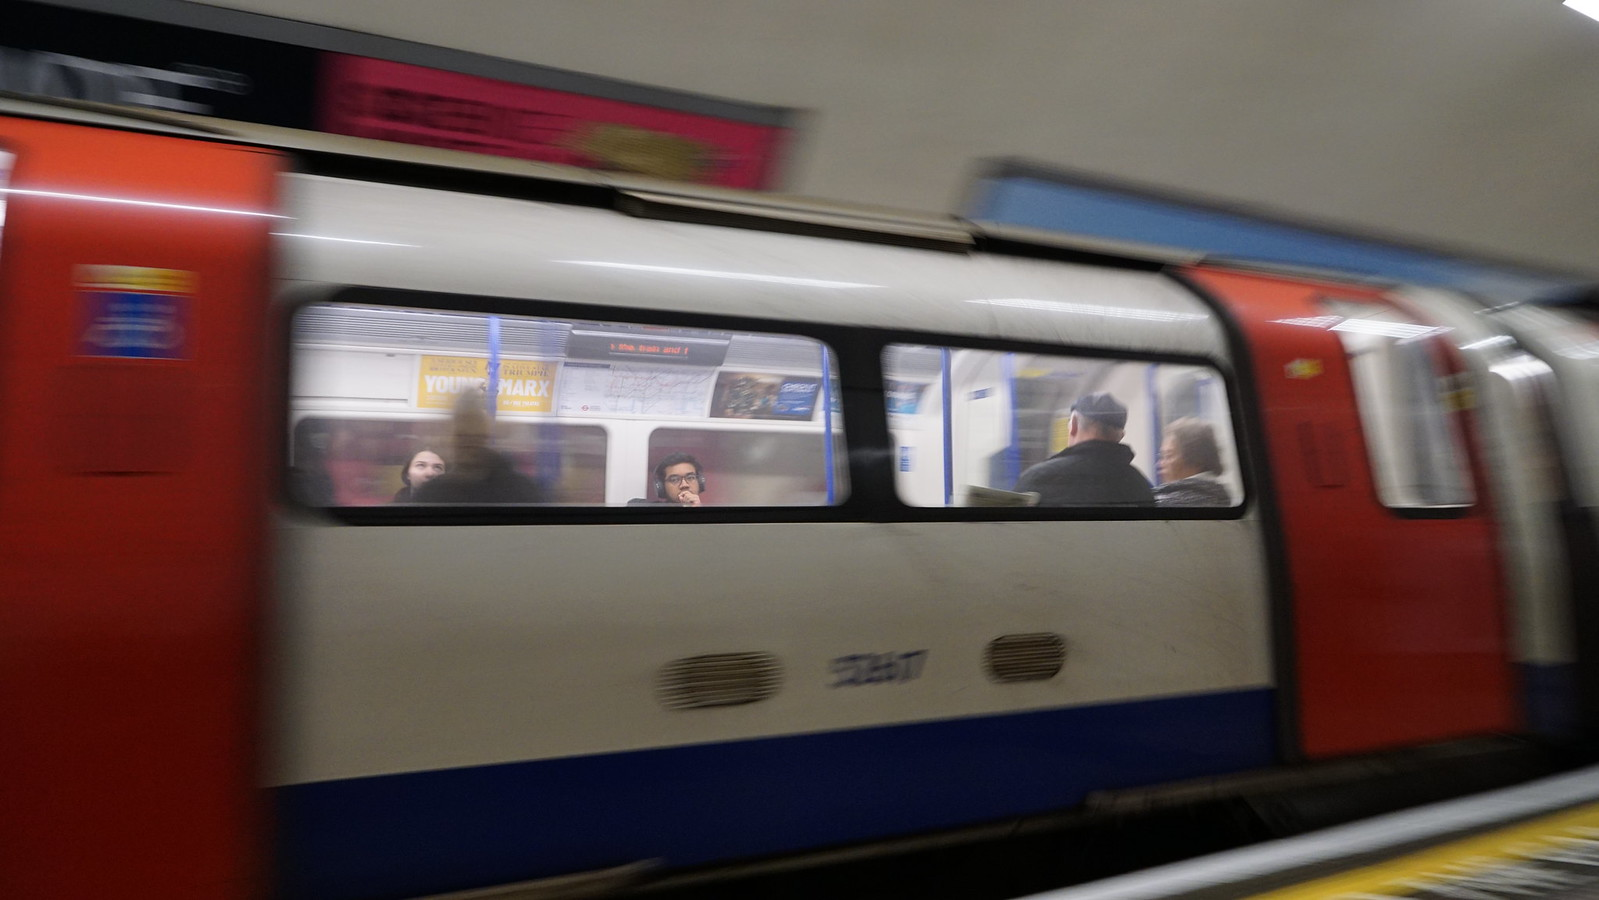 Londres por partes (I) en Nuestros reportajes40104537602_be93a9d2dd_h